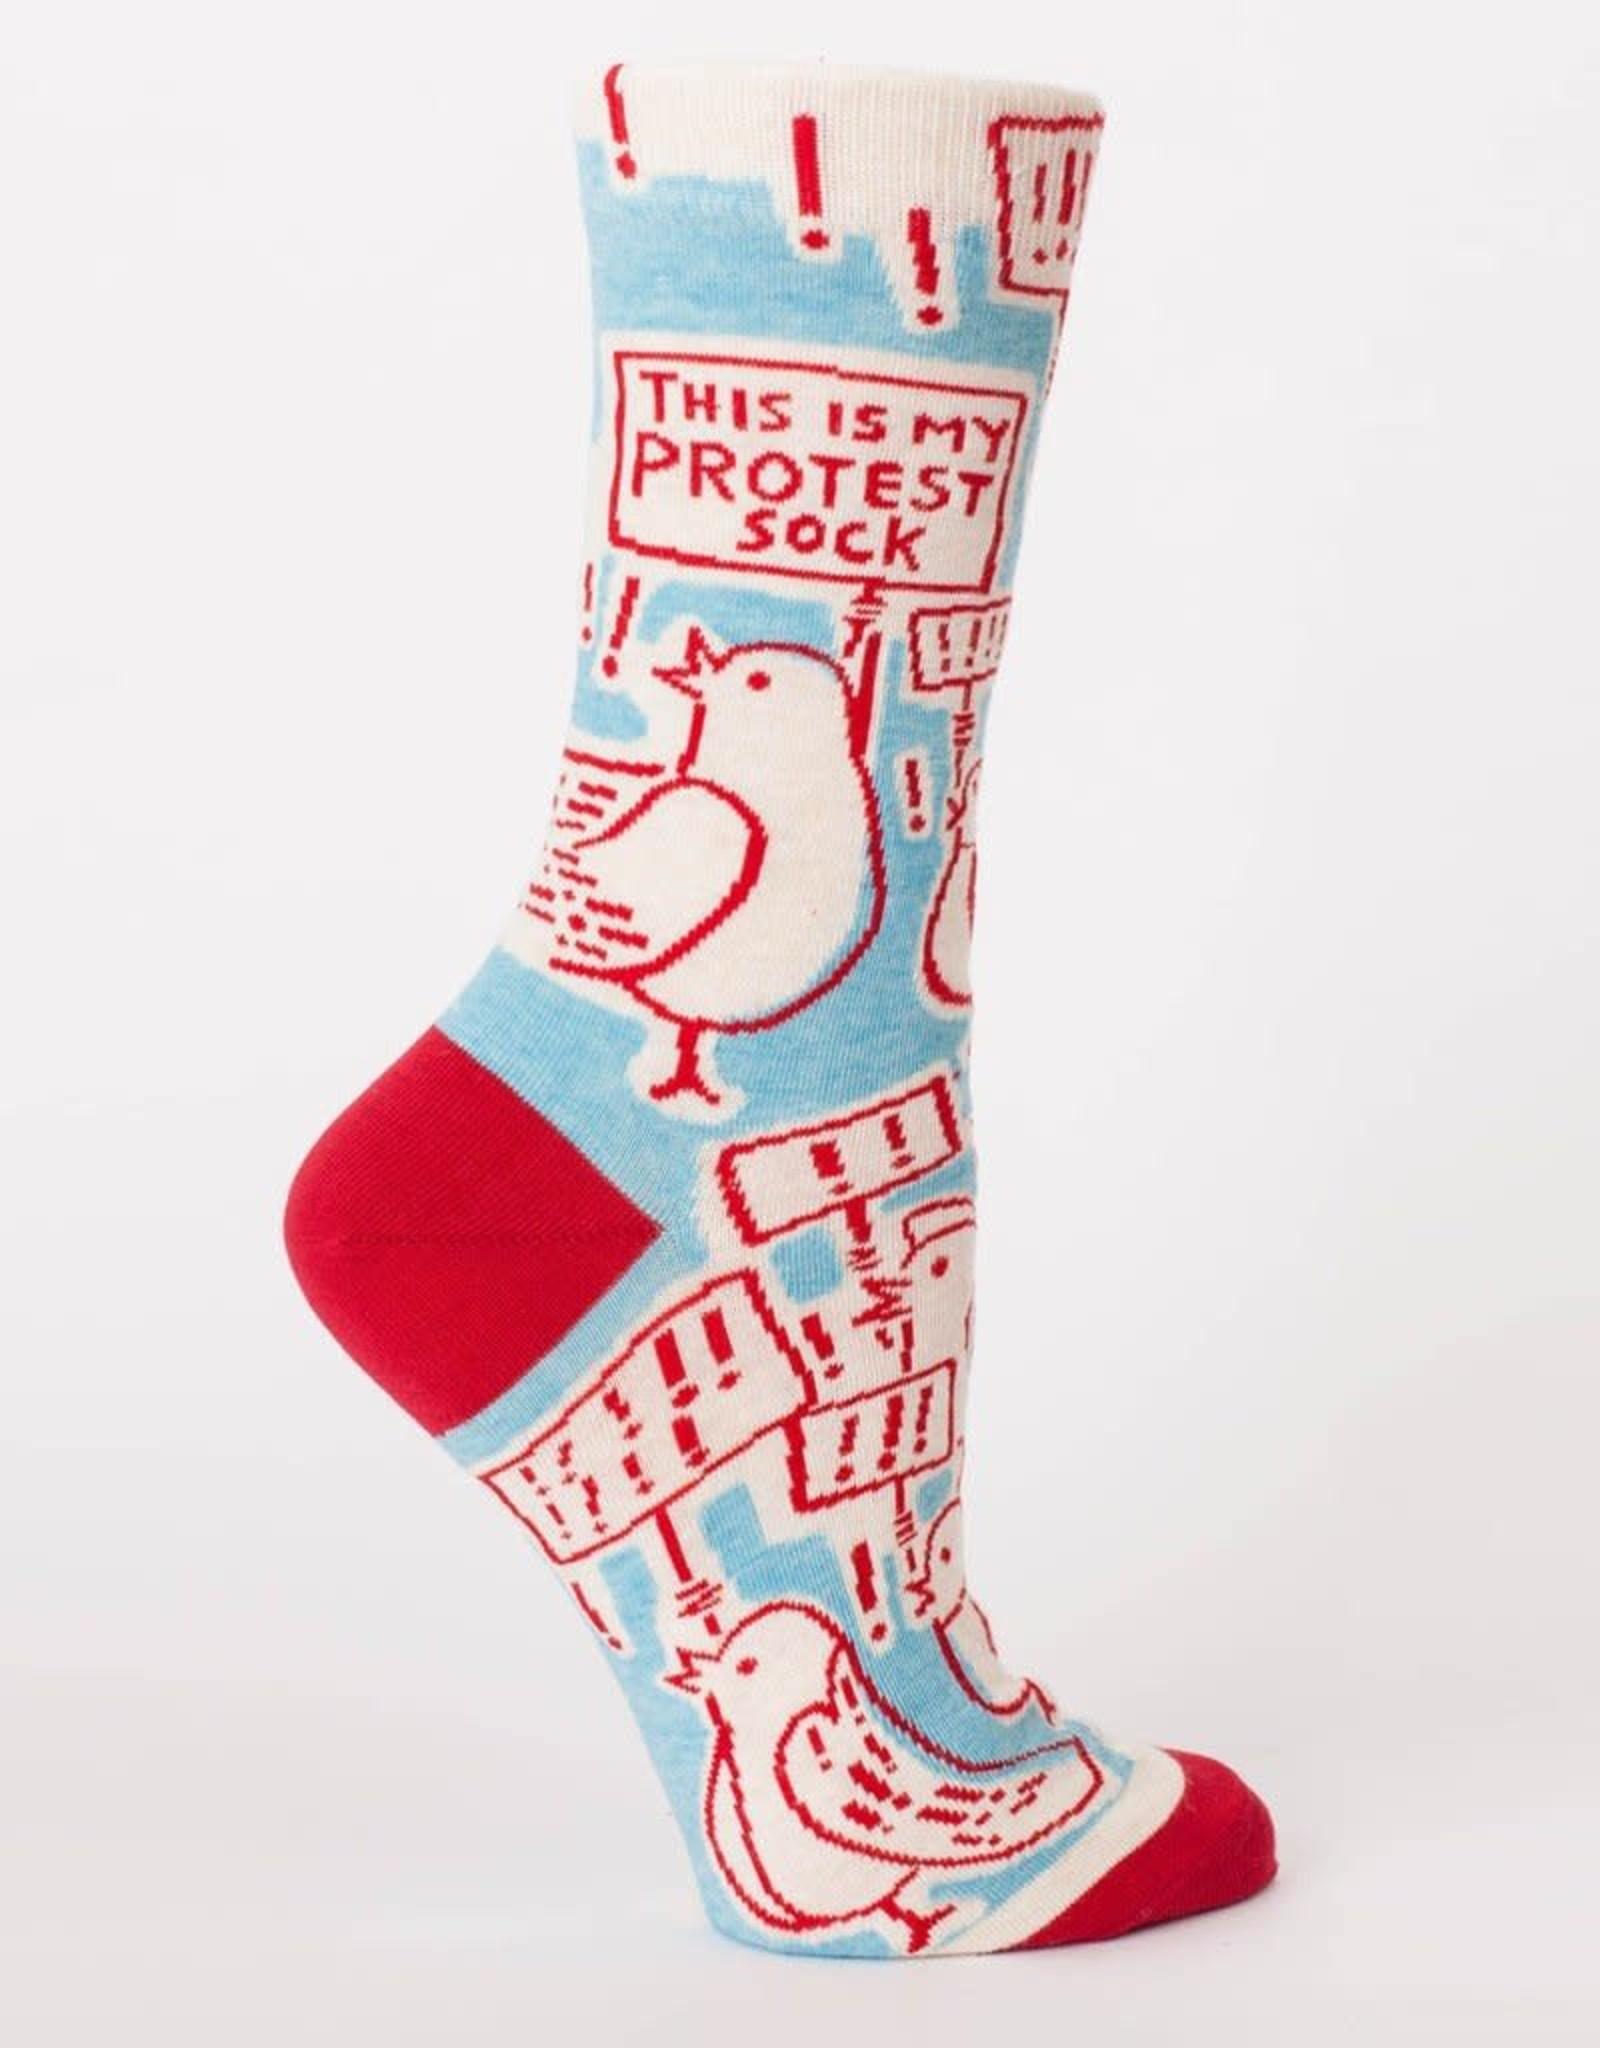 My Protest Socks